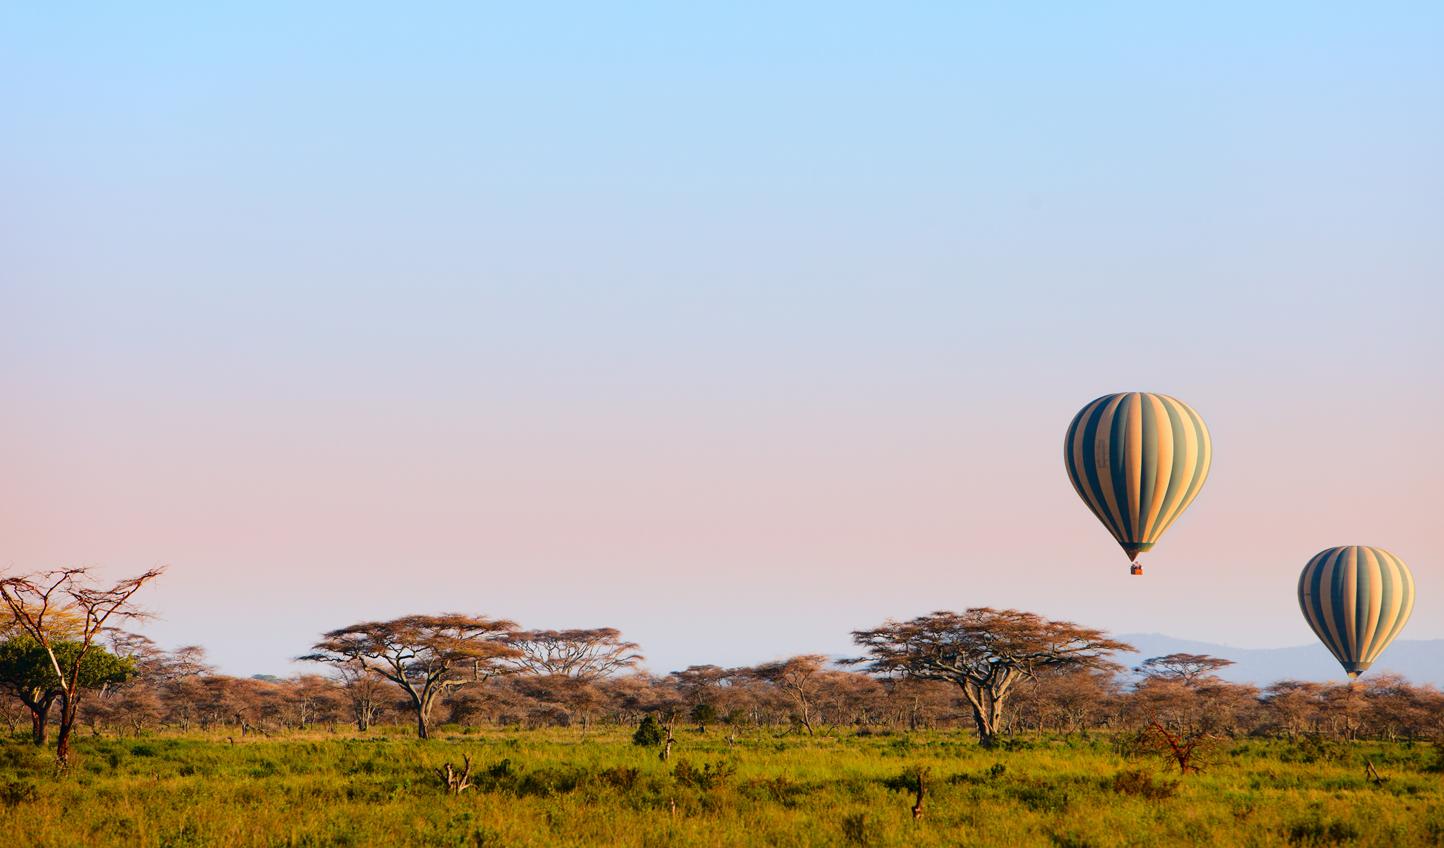 Embark on a hot air ballooning adventure over the savannah